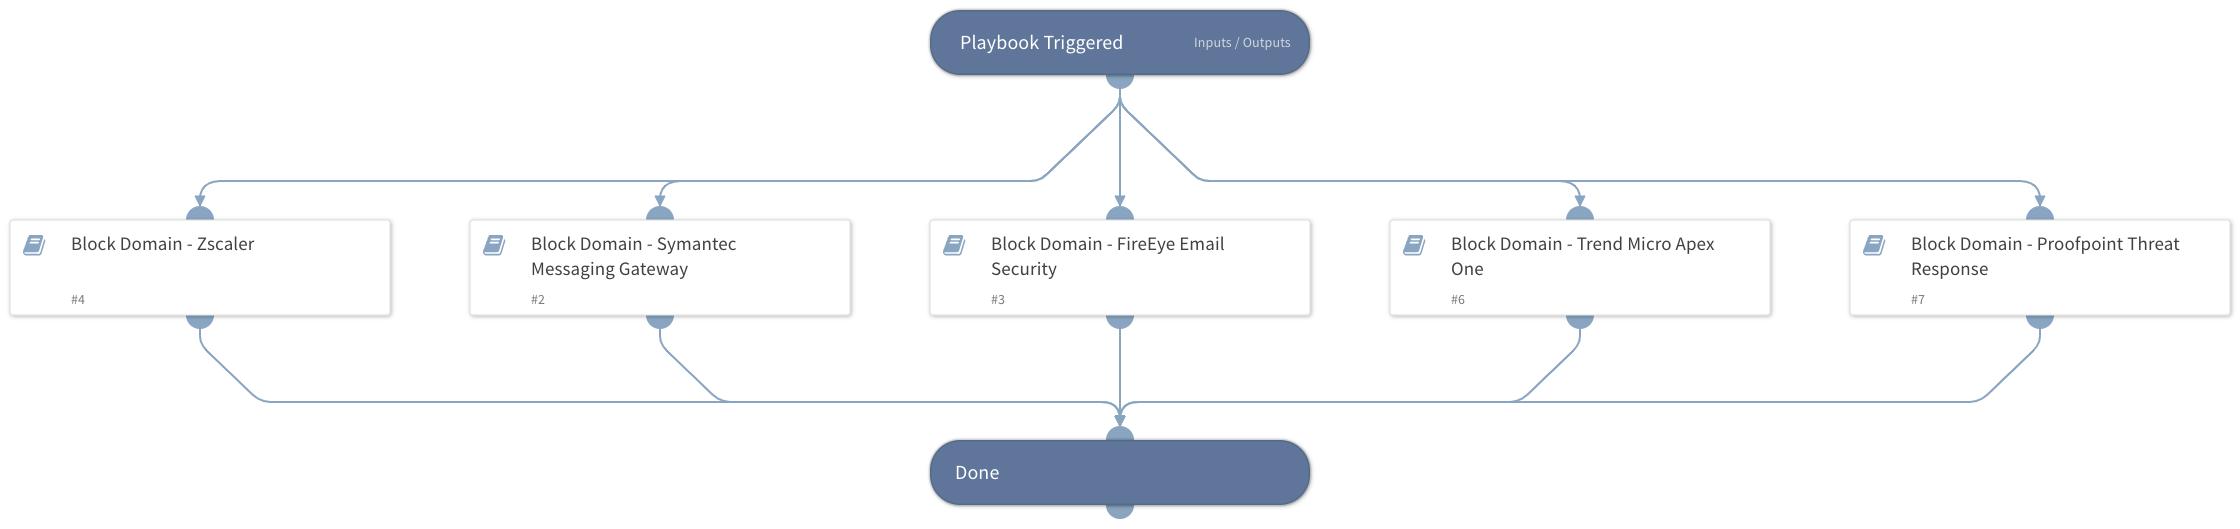 Block Domain - Generic